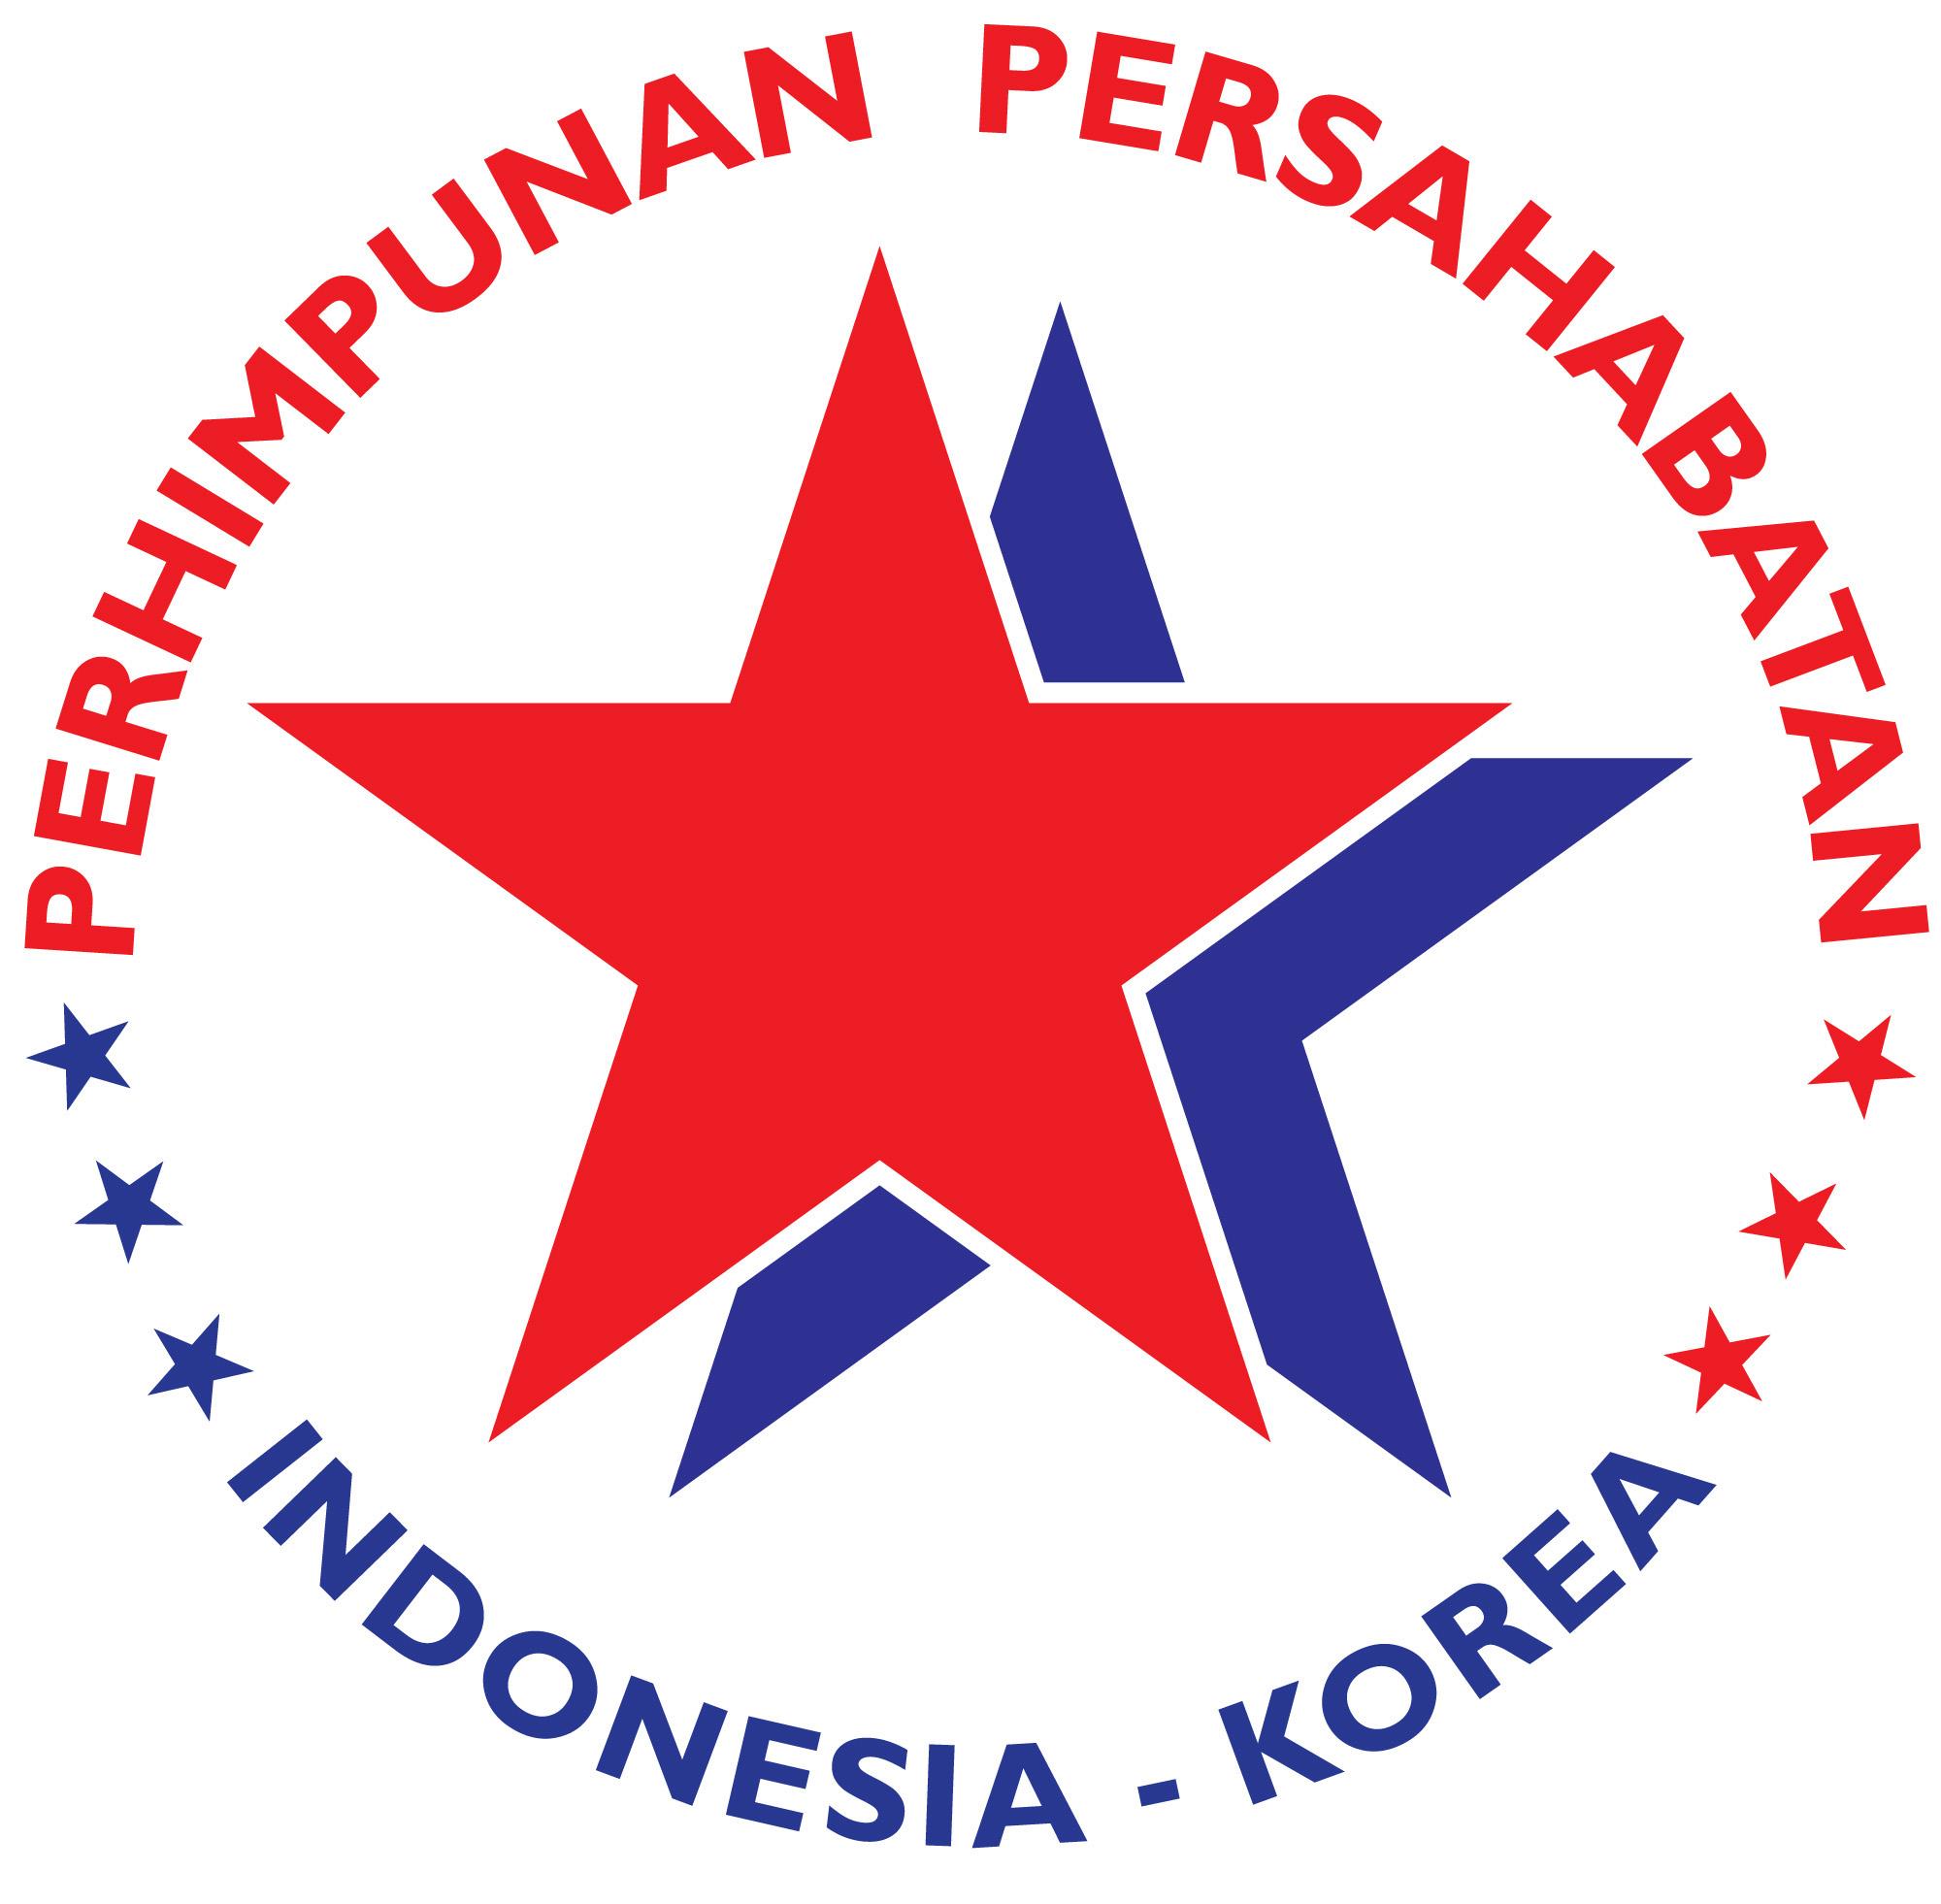 stempel-logo-indonesia-korea